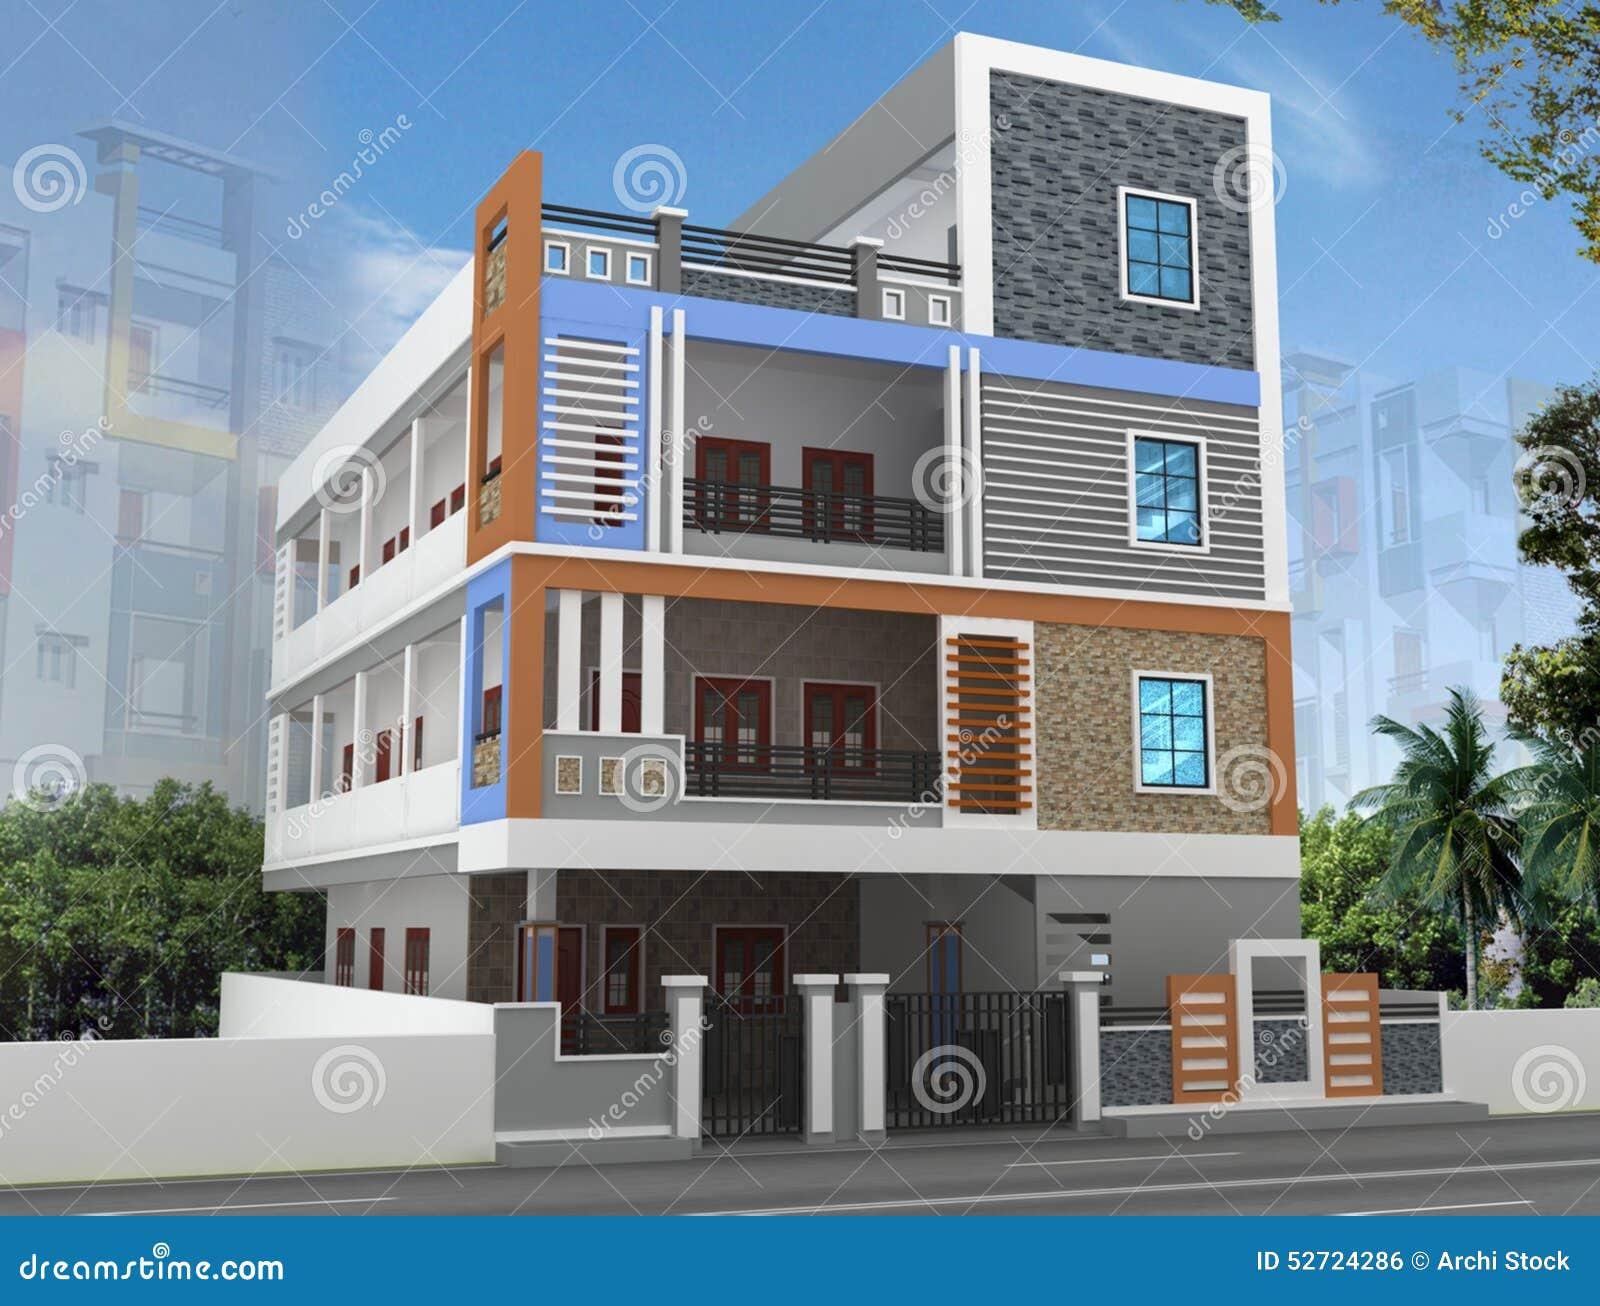 3D Building Elevation Stock Photo Image 52724286